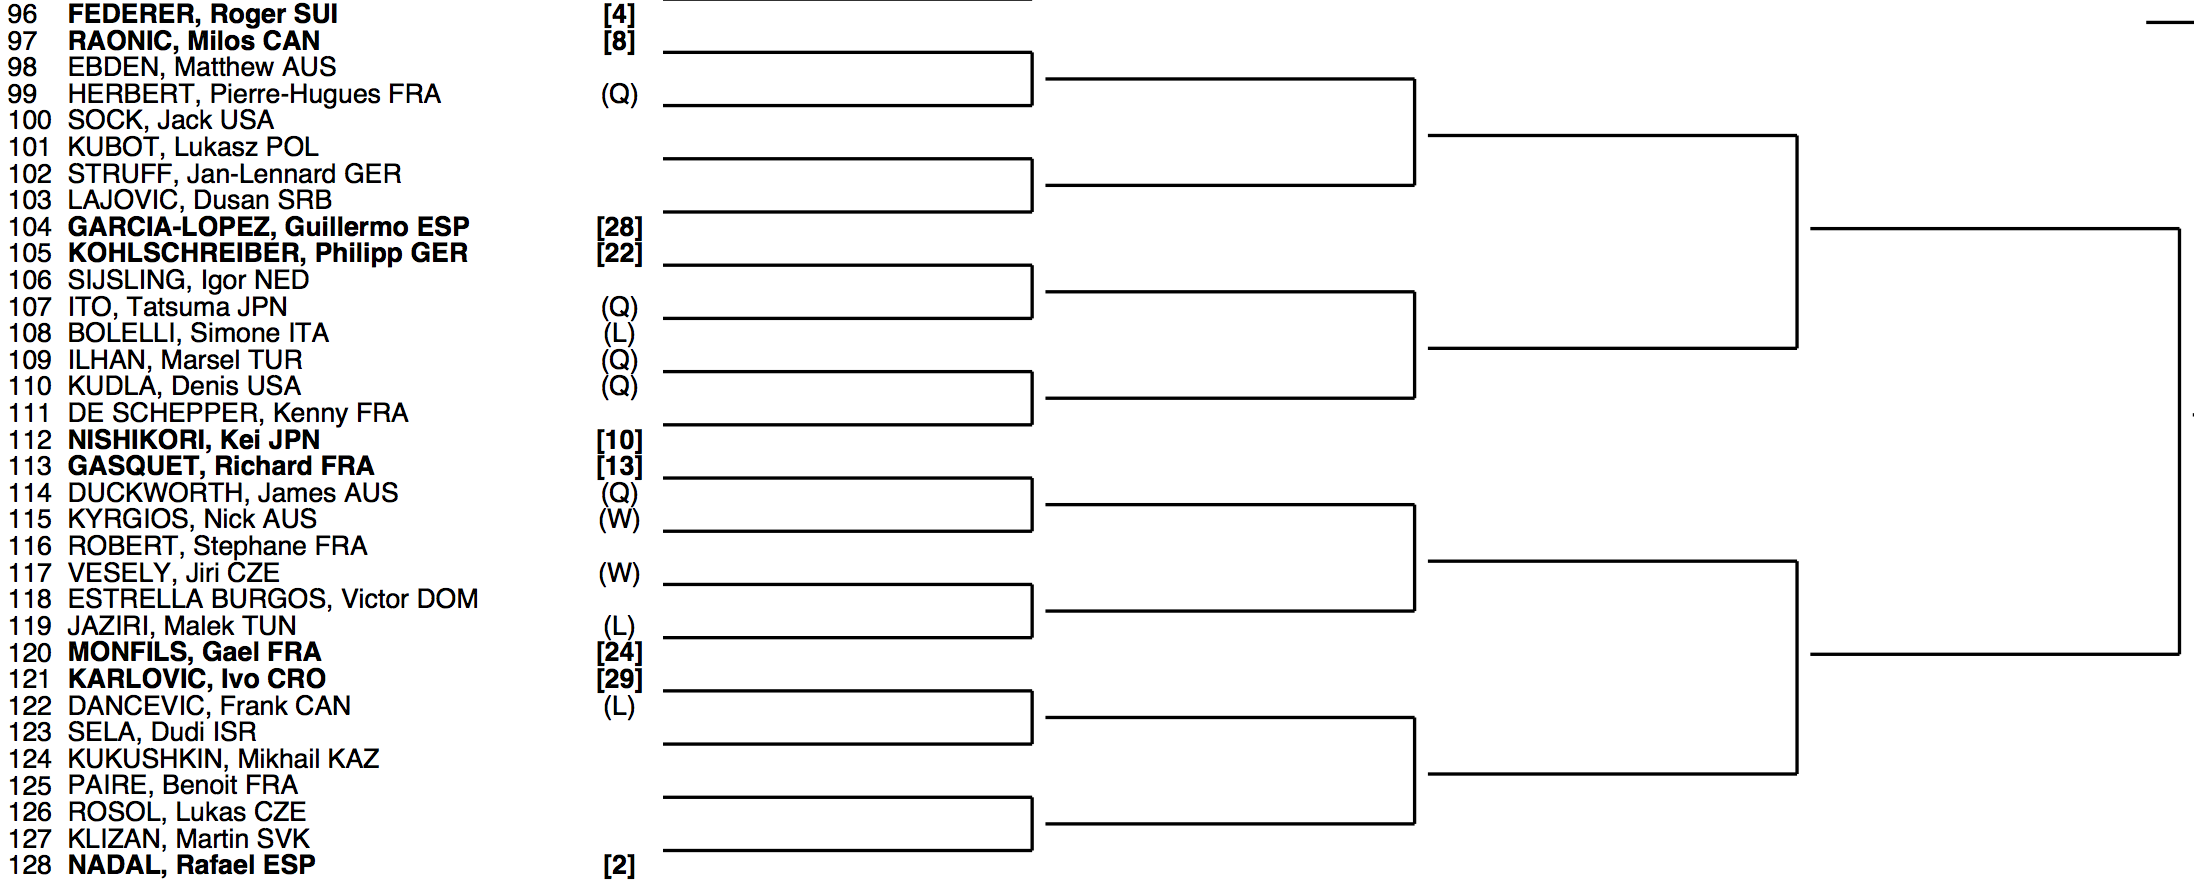 Wimbledon 2014 Draw 4:4